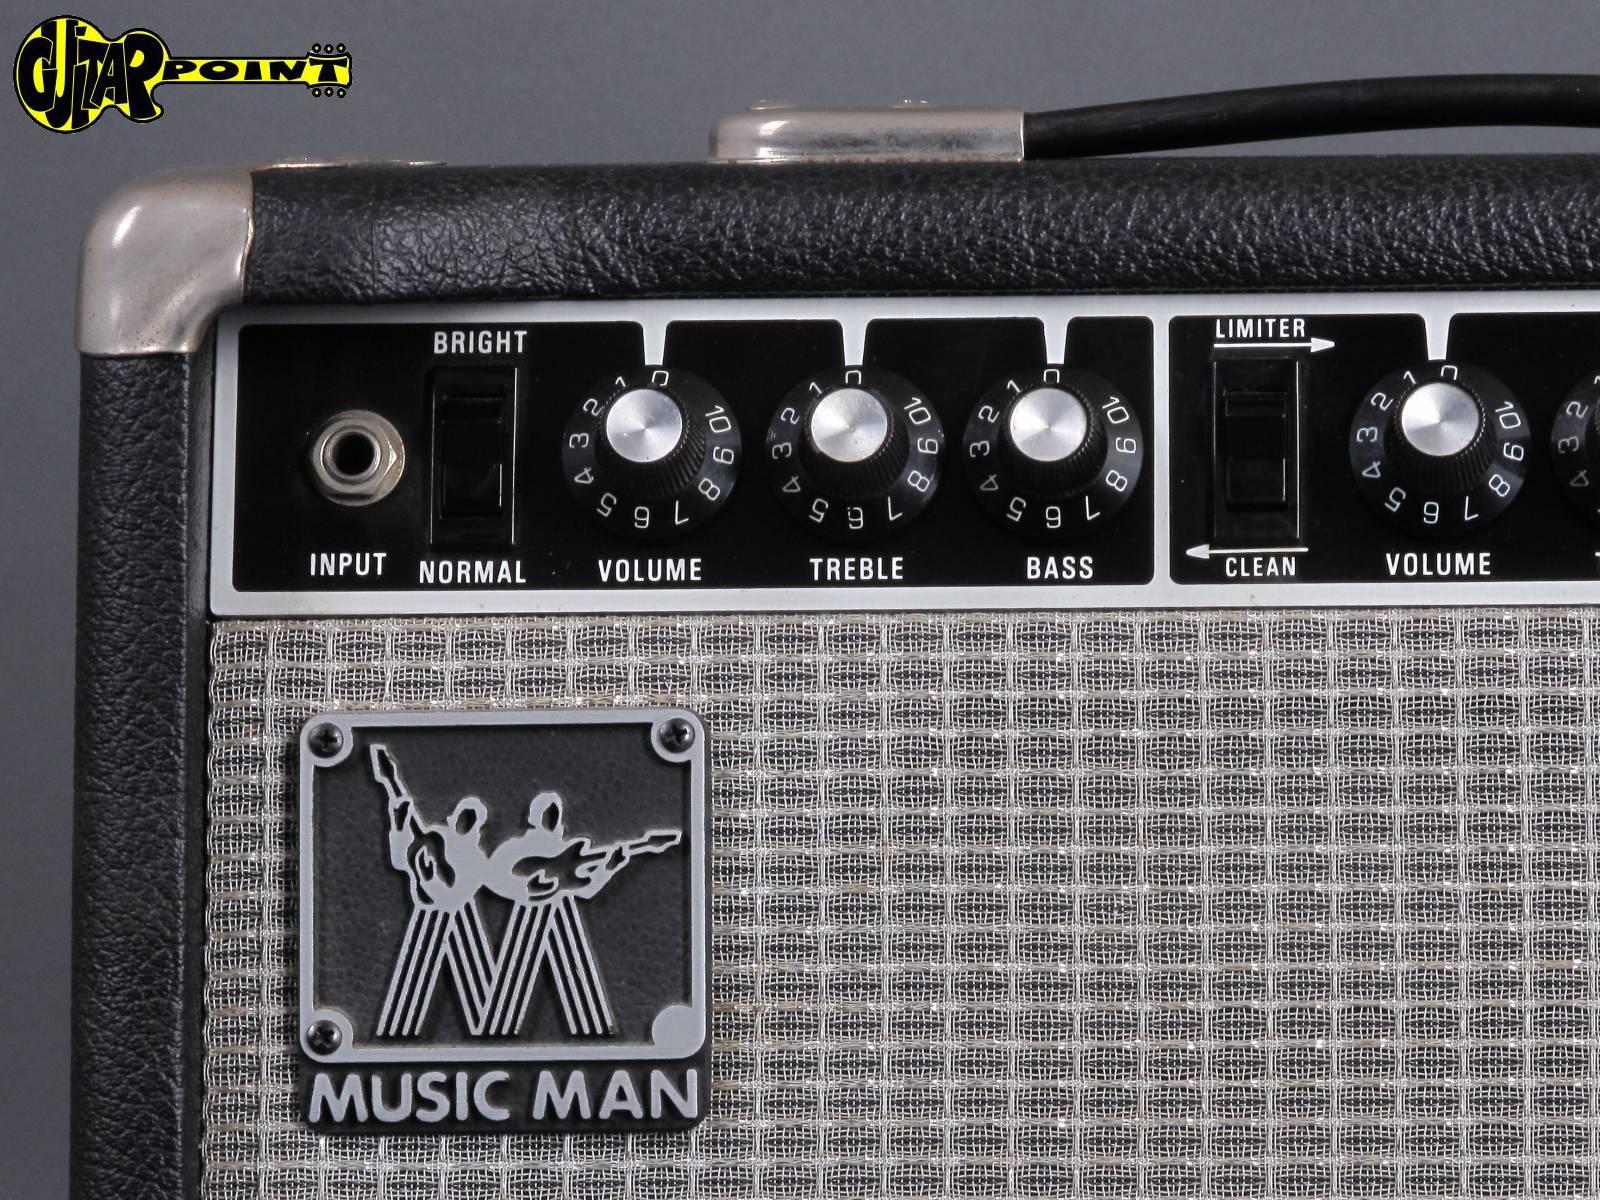 1982 Music Man 110 Rd Fifty 50 Watt Vi82musicmanrd110en09848 Voltage Limiter For Guitar Amplifiers